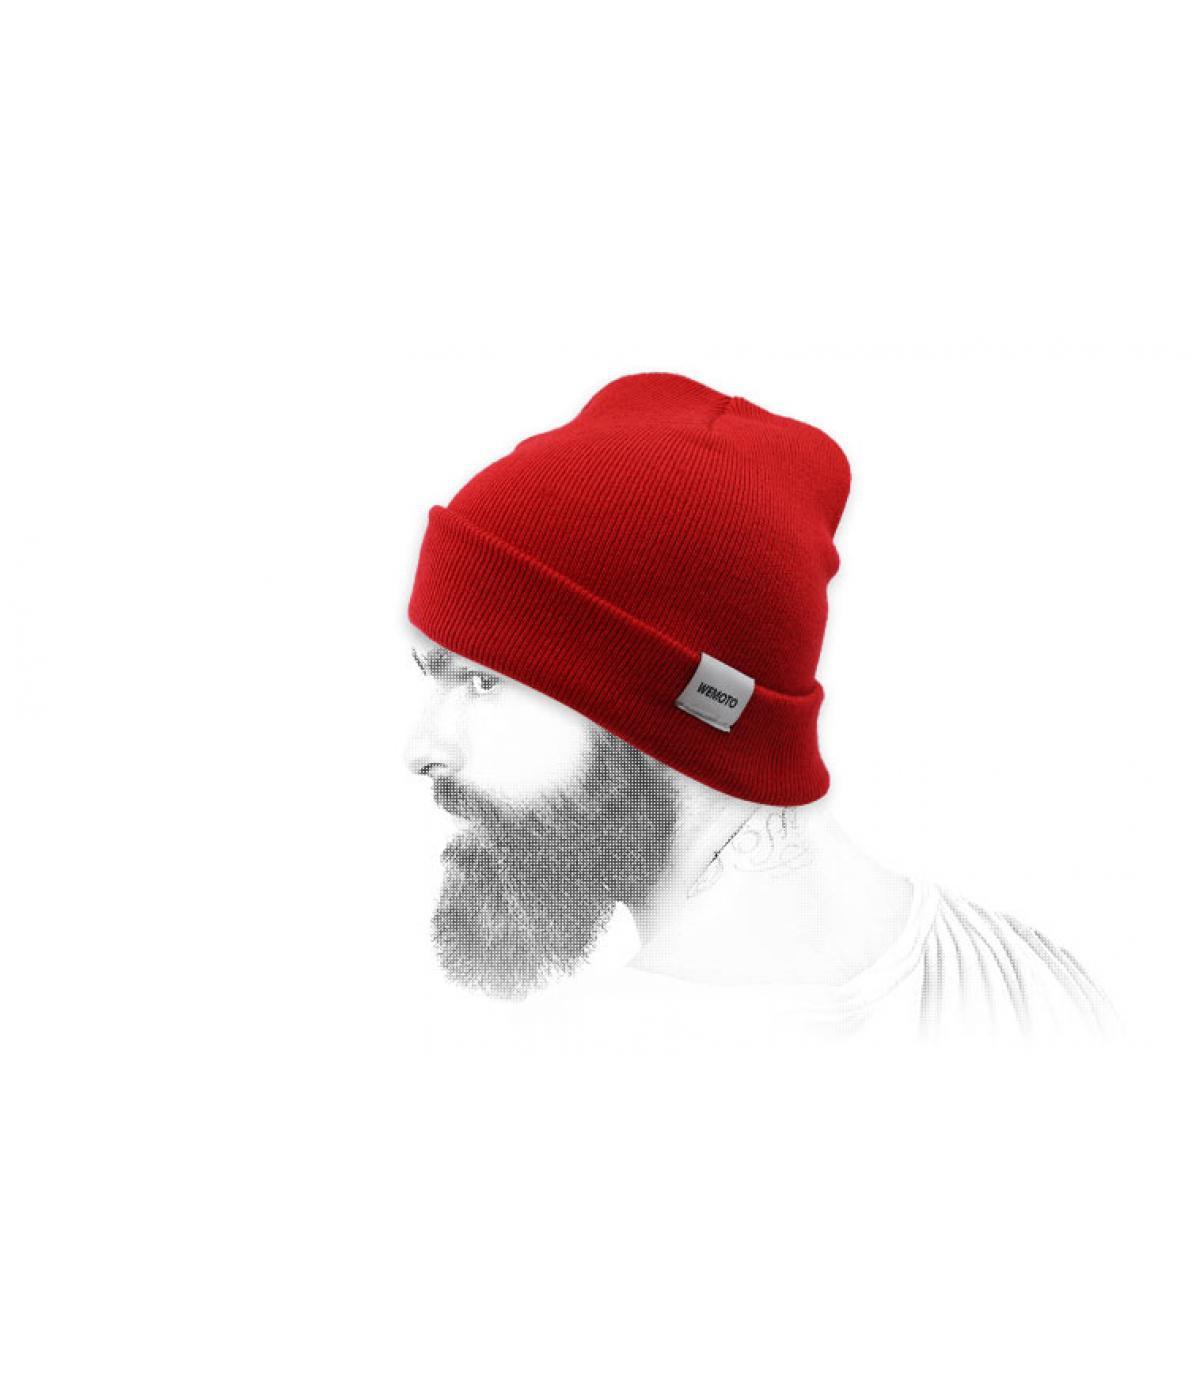 cappello a bavero rosso Wemoto